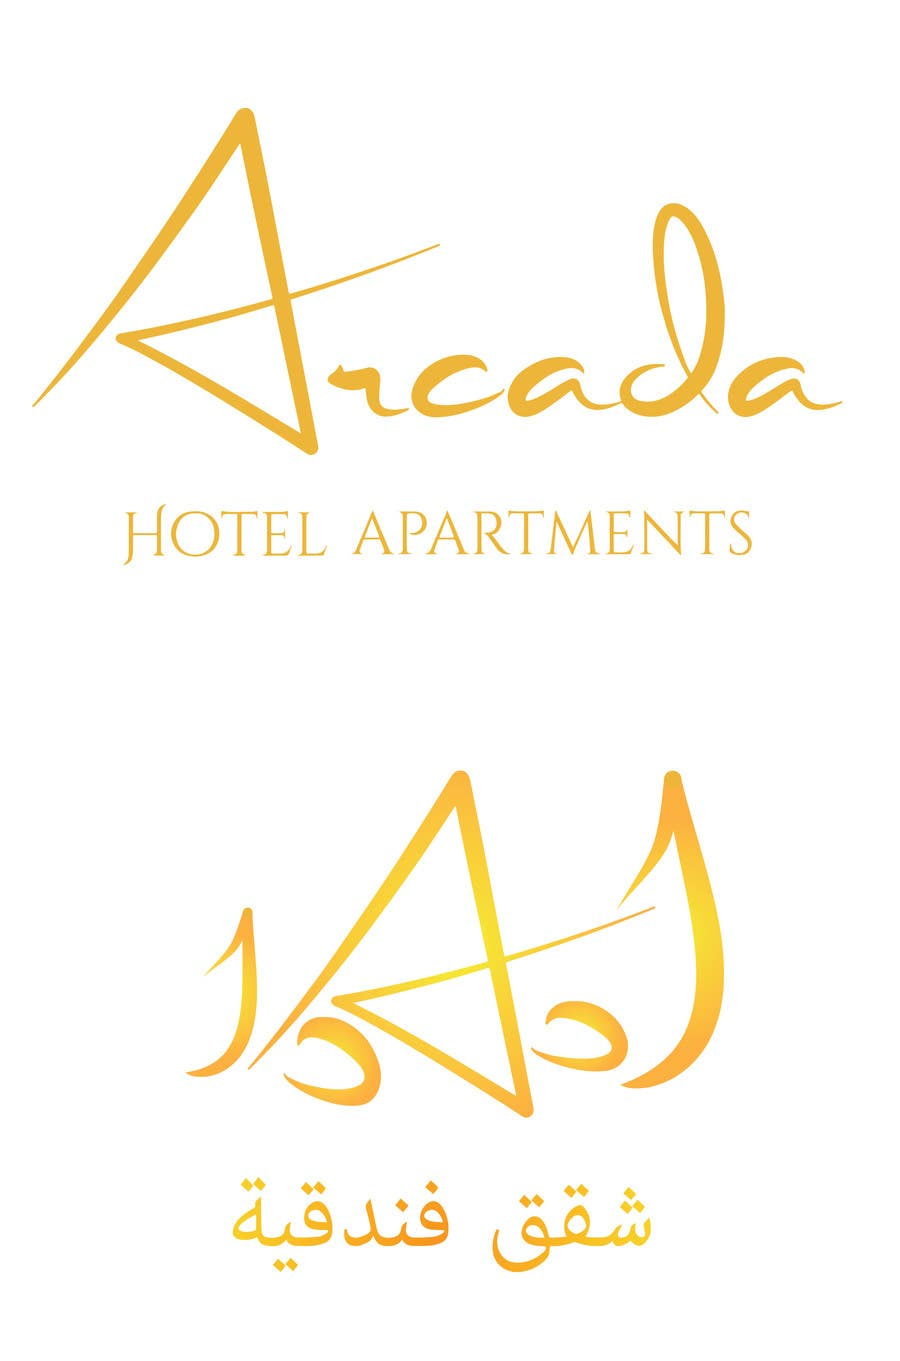 Proposition n°108 du concours Re-Design Arabic Logo for Hotel